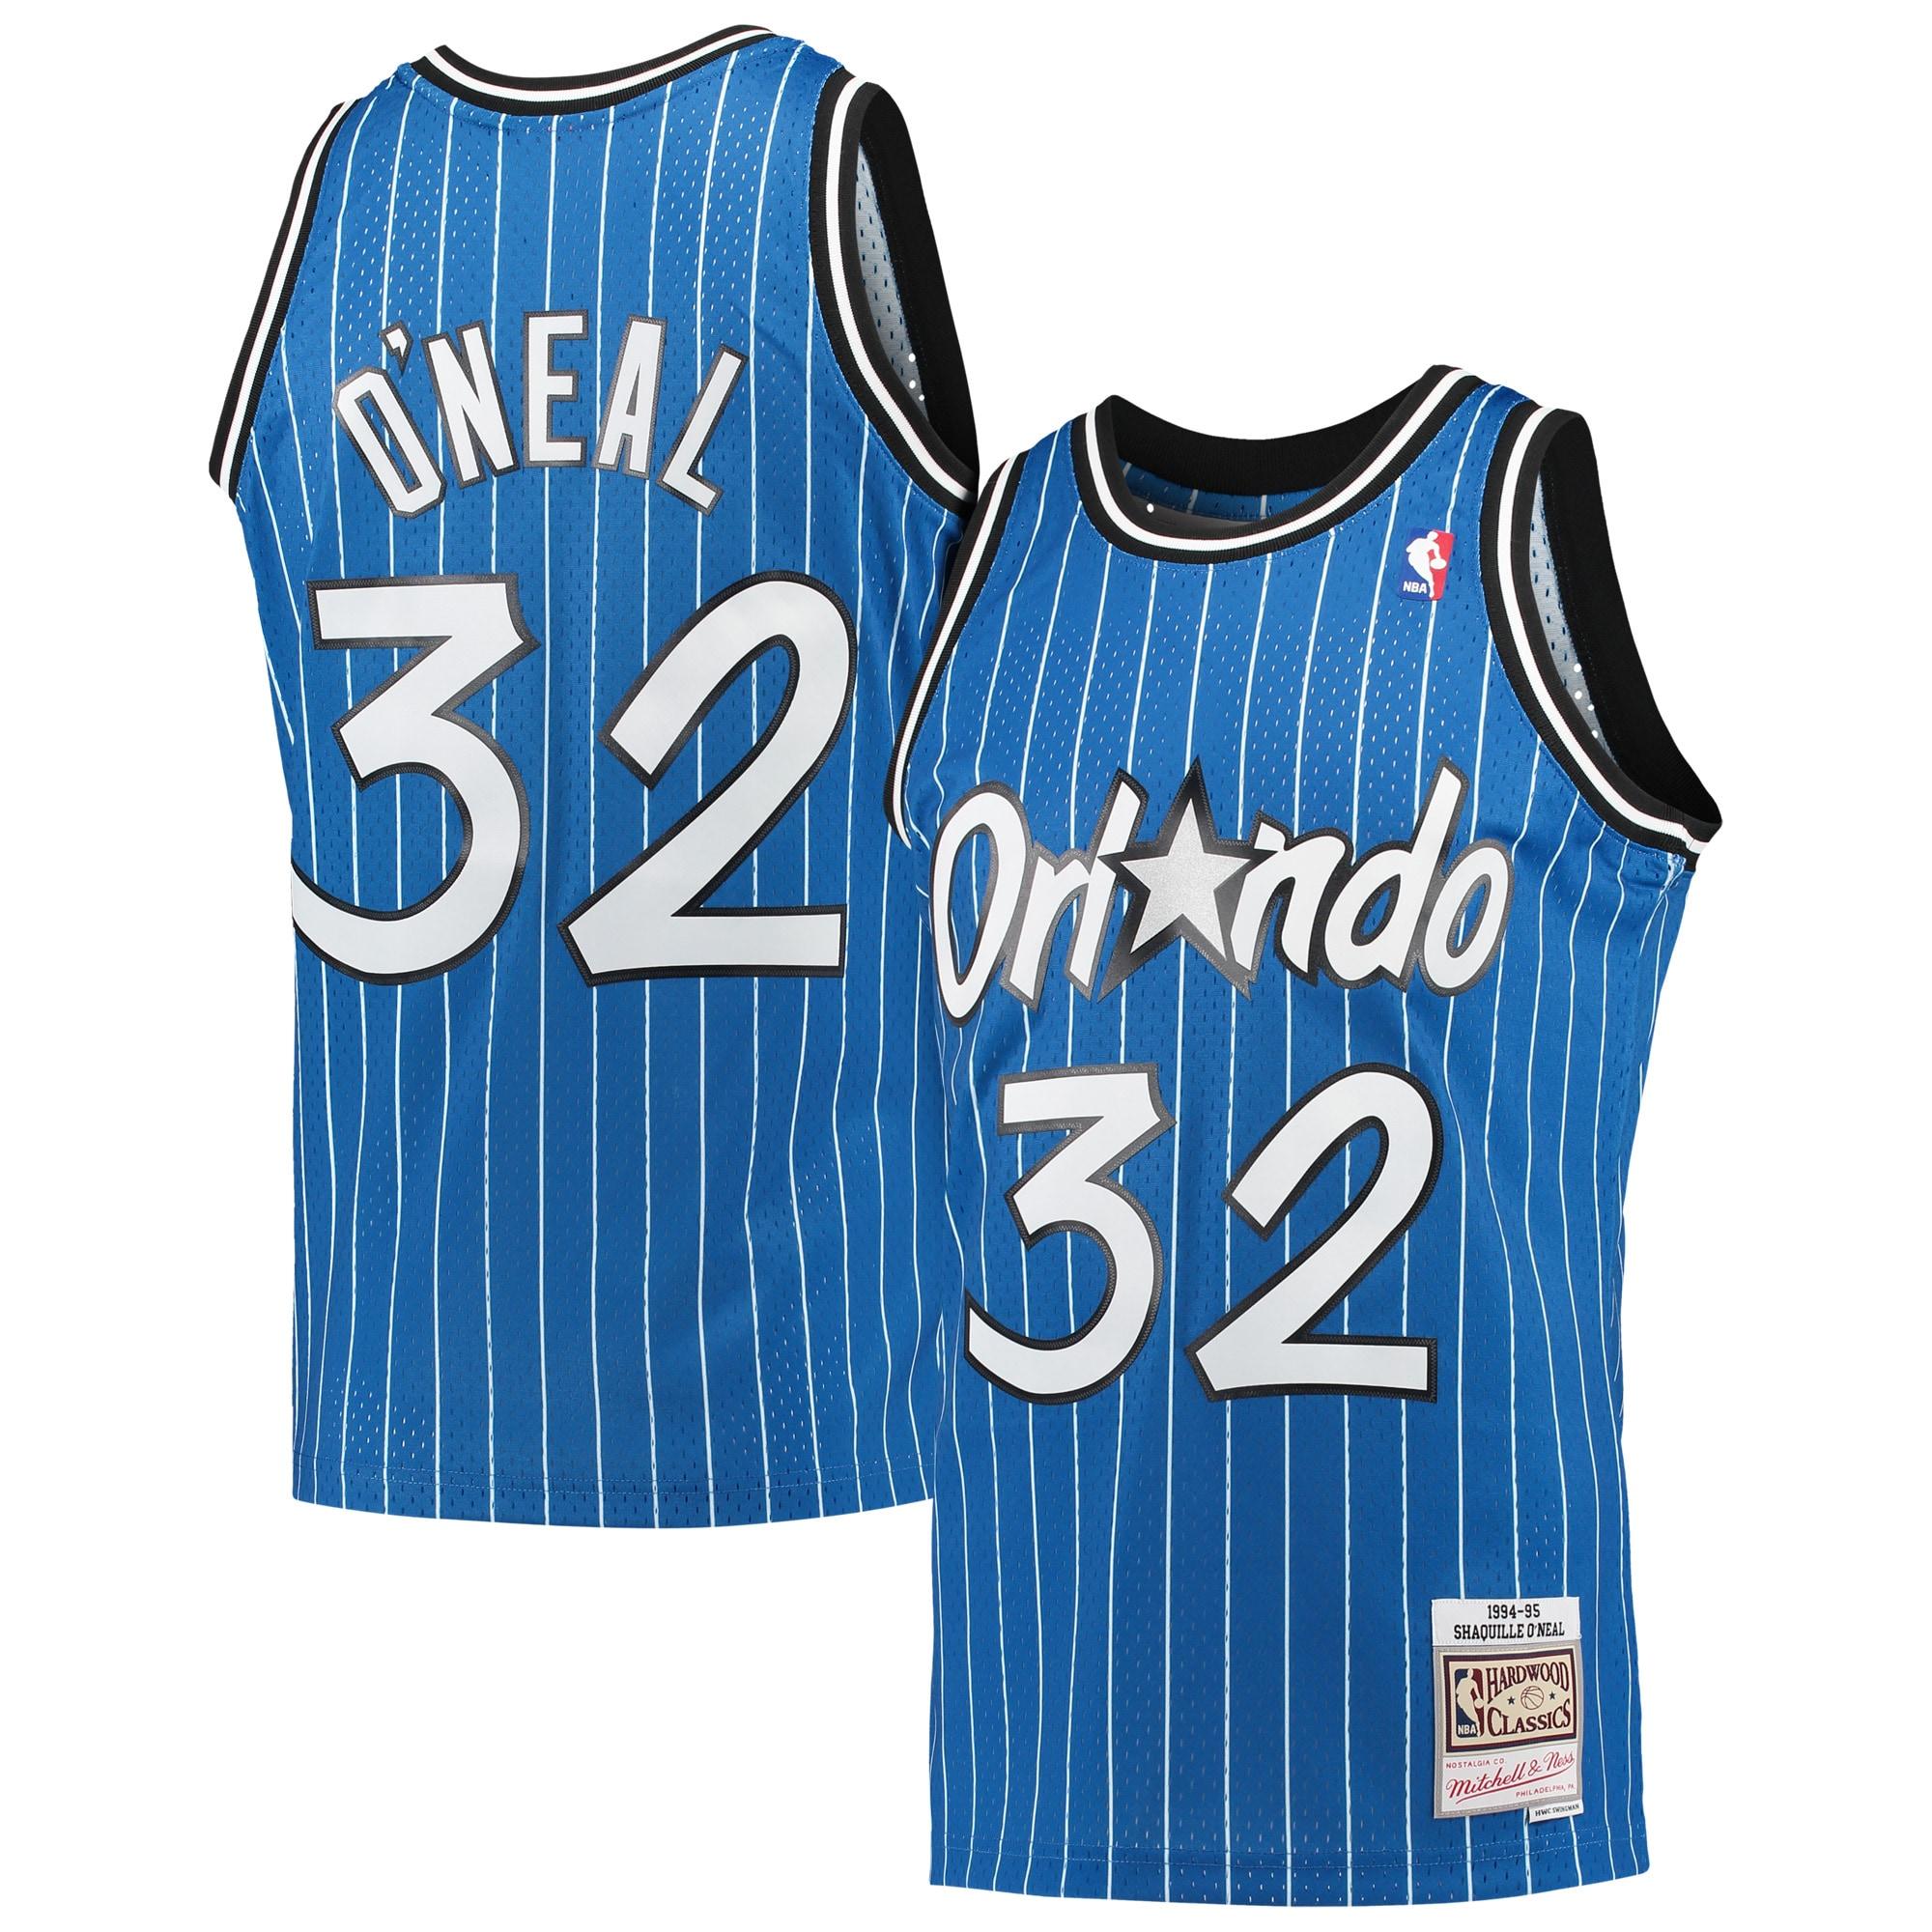 Shaquille O'Neal Orlando Magic Mitchell & Ness Hardwood Classics 1994-95 Swingman Jersey - Blue